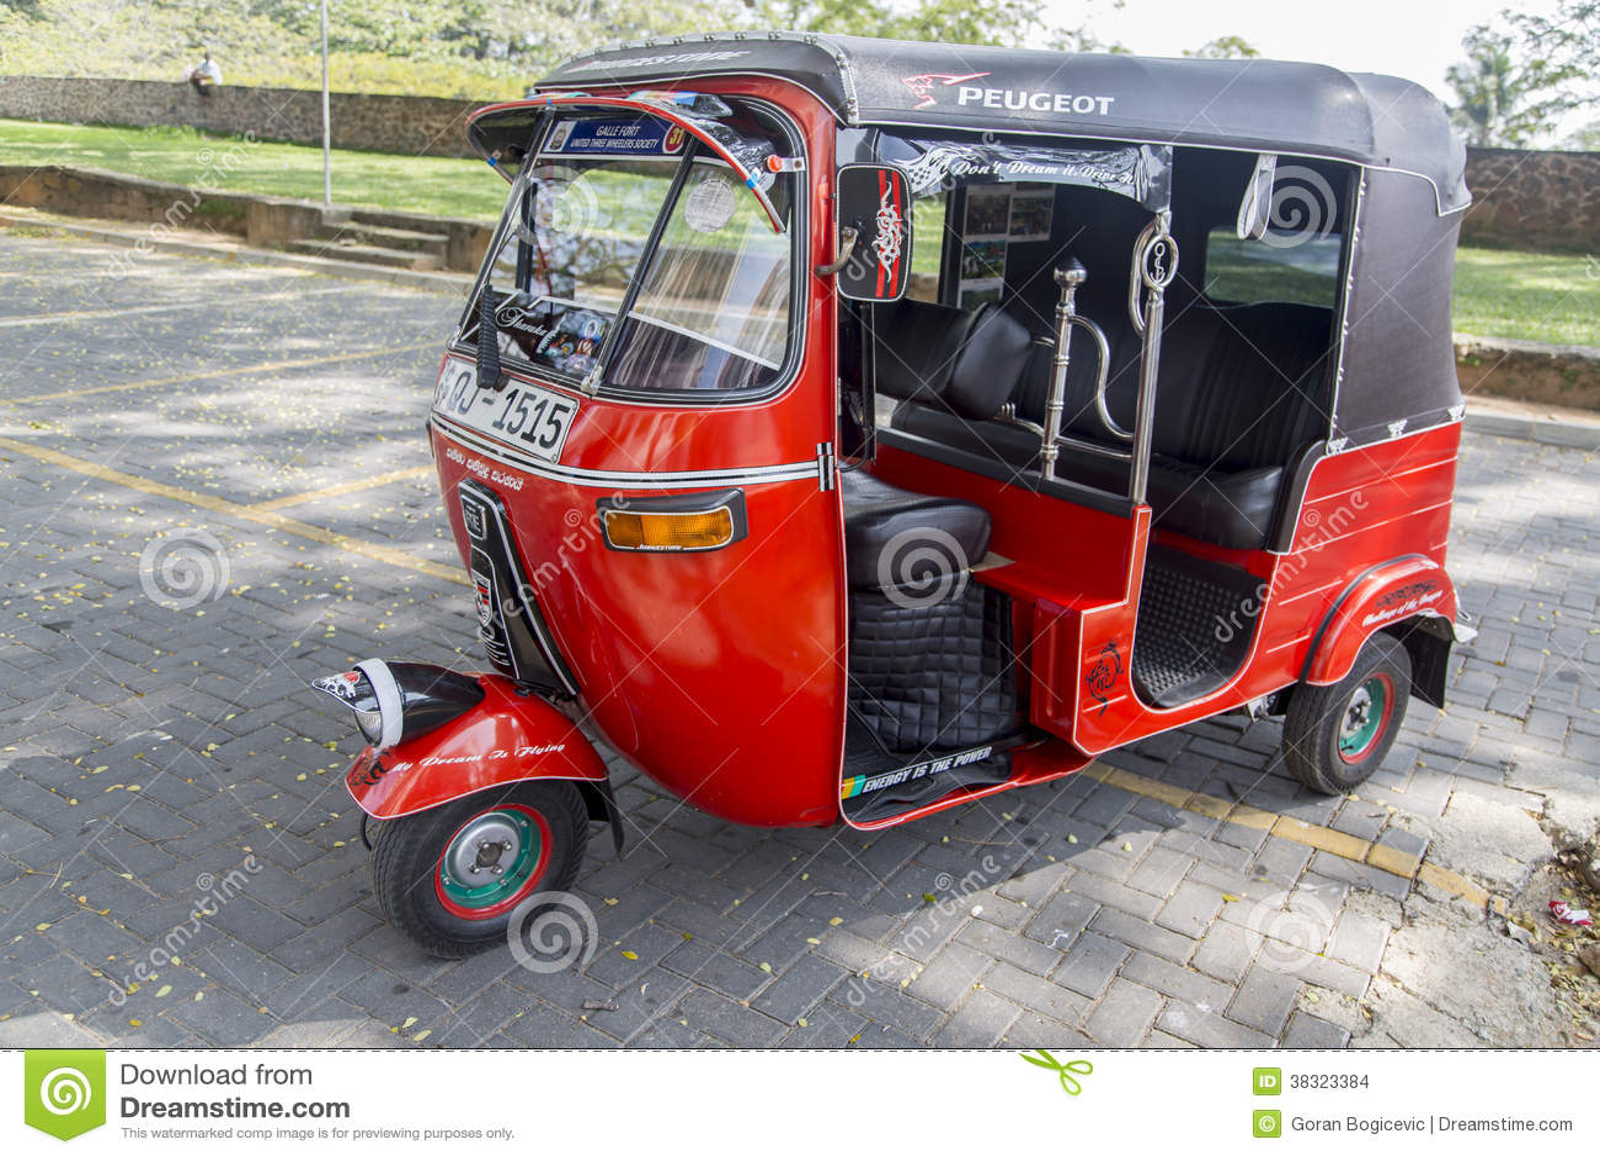 auto rickshaw and foreign tourist